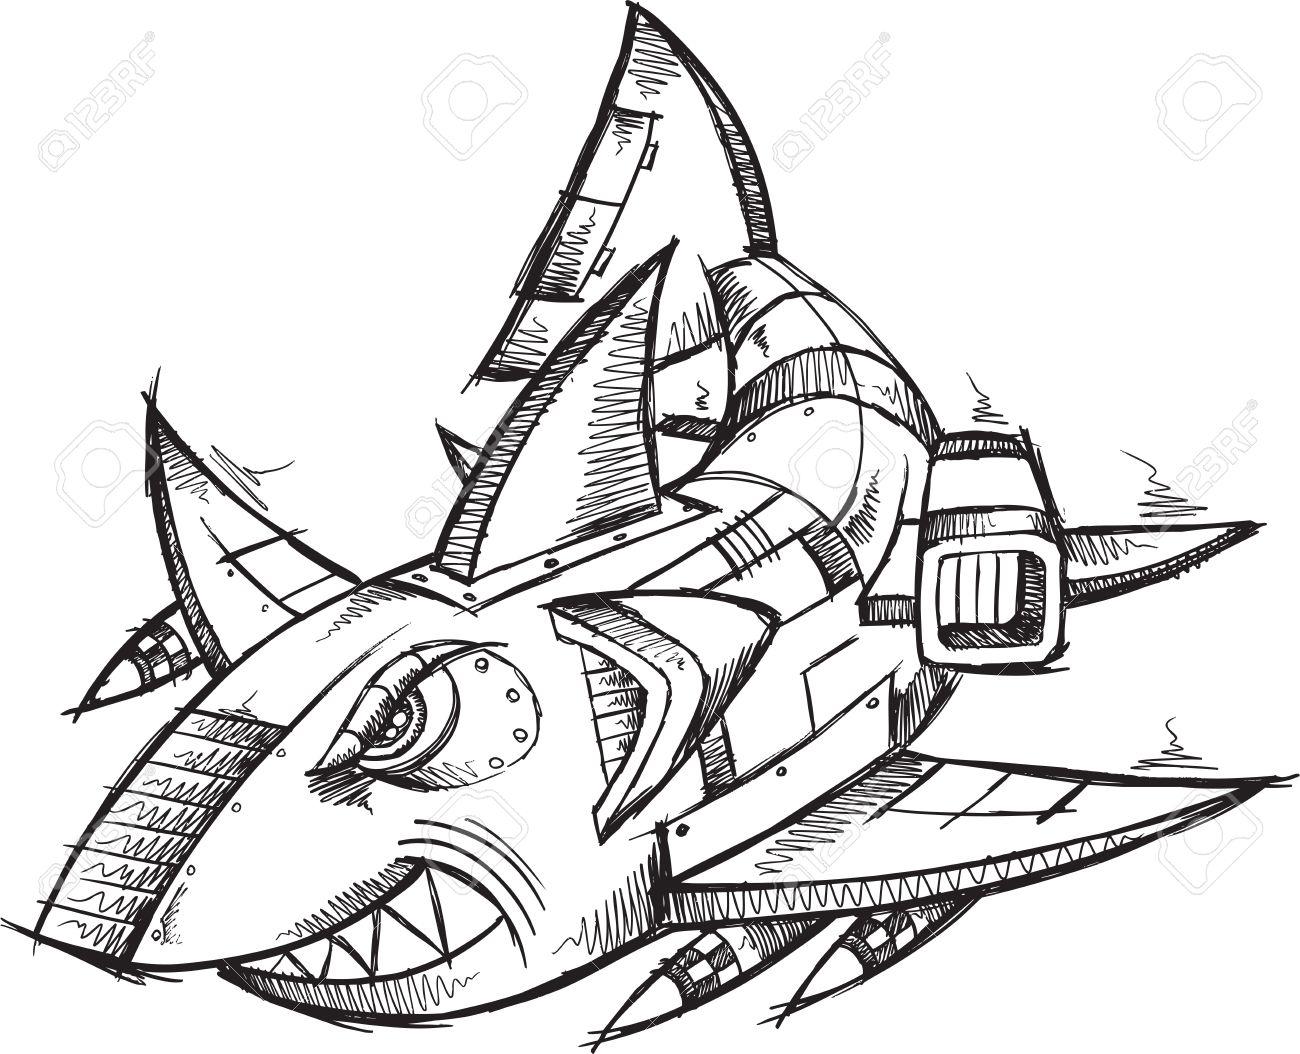 1300x1054 Sketch Doodle Robot Cyborg Shark Royalty Free Cliparts, Vectors